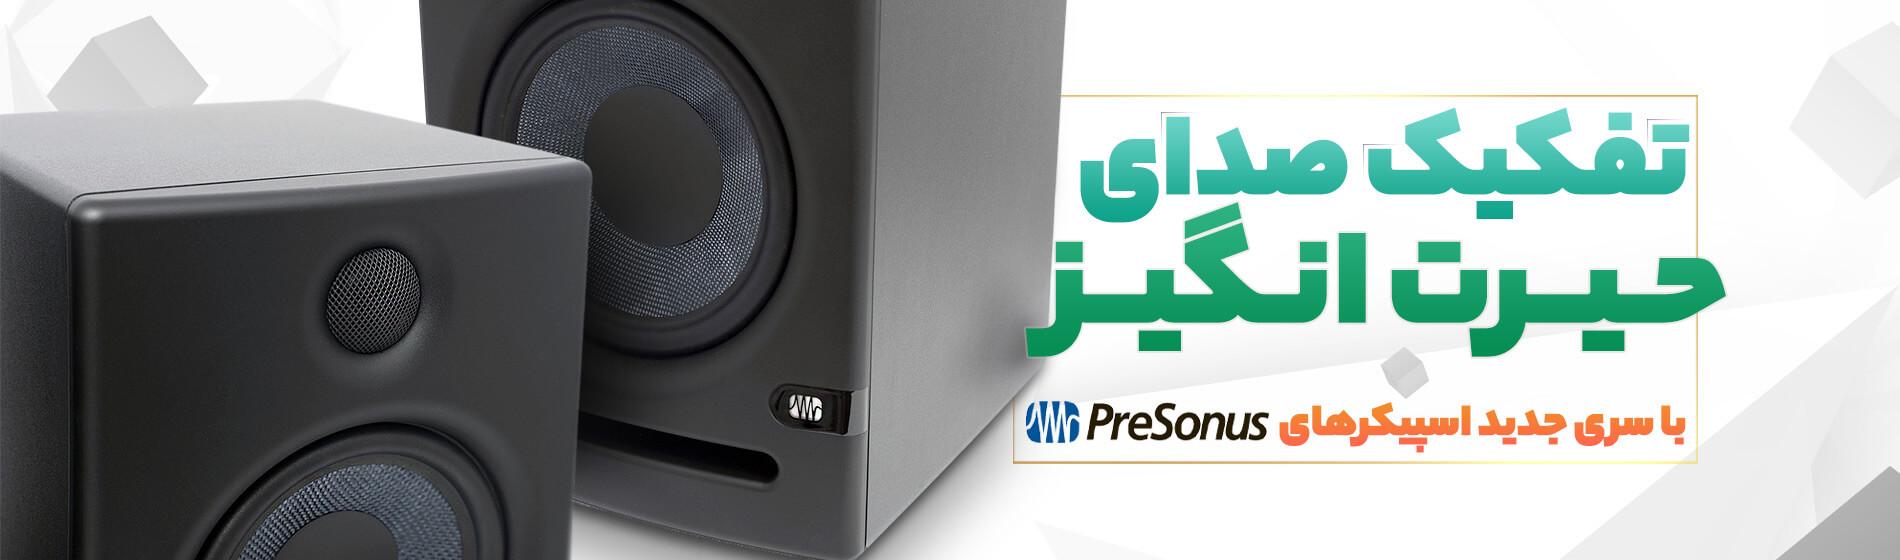 Presonus-Speakers